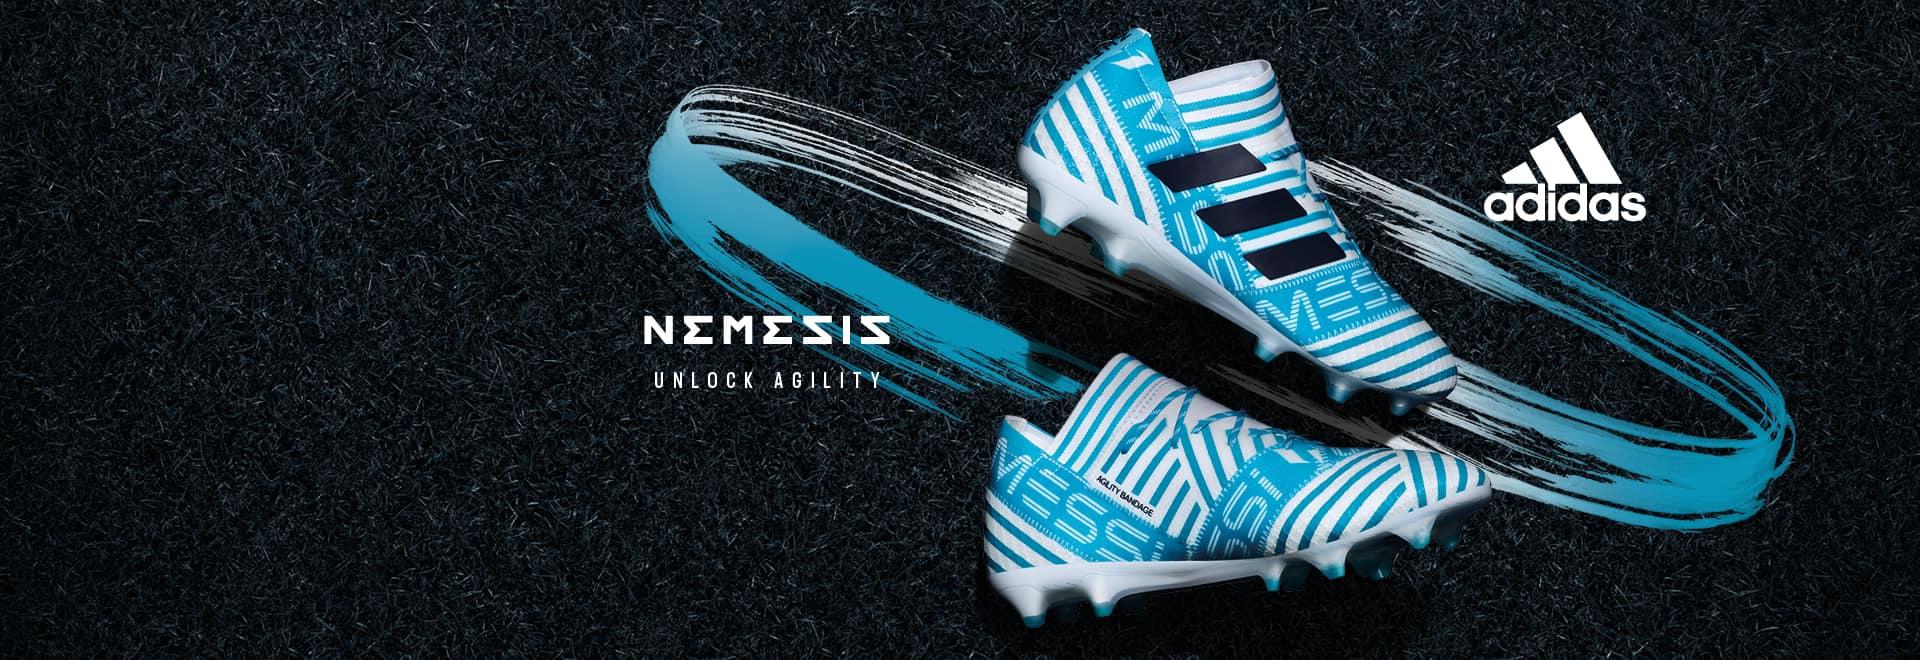 adidas Ocean Storm Nemeziz Messi Boots